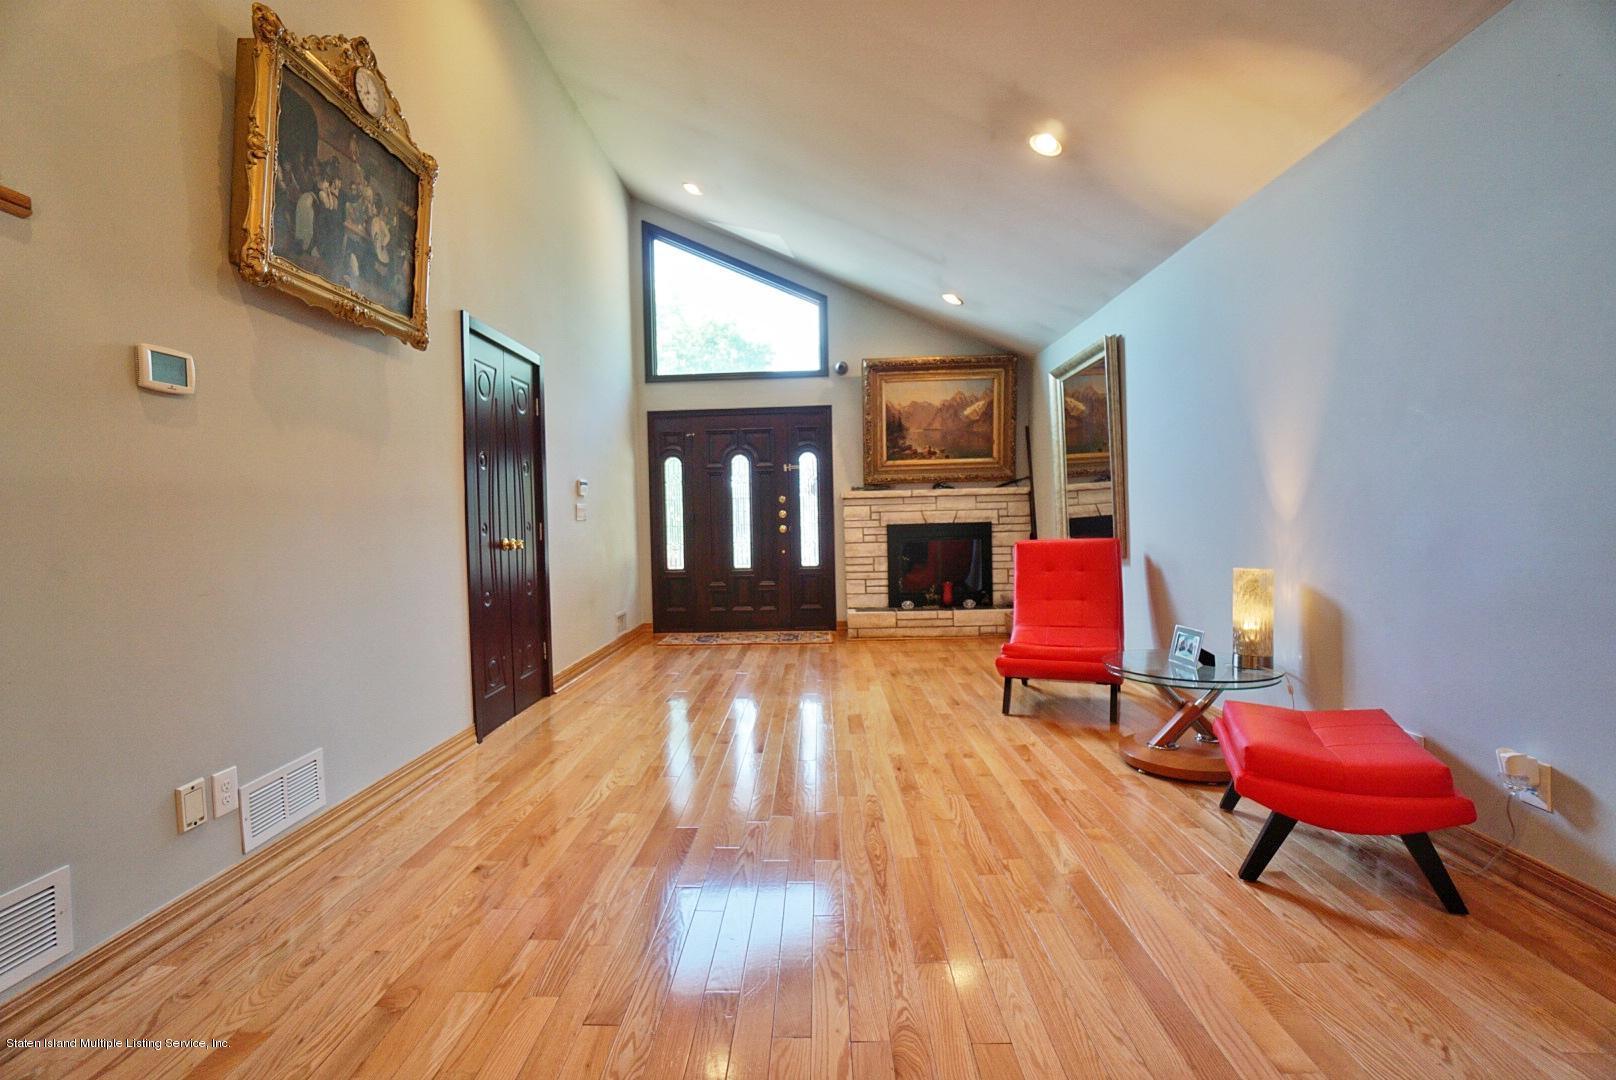 Single Family - Detached 48 Ocean Terrace  Staten Island, NY 10314, MLS-1130826-14